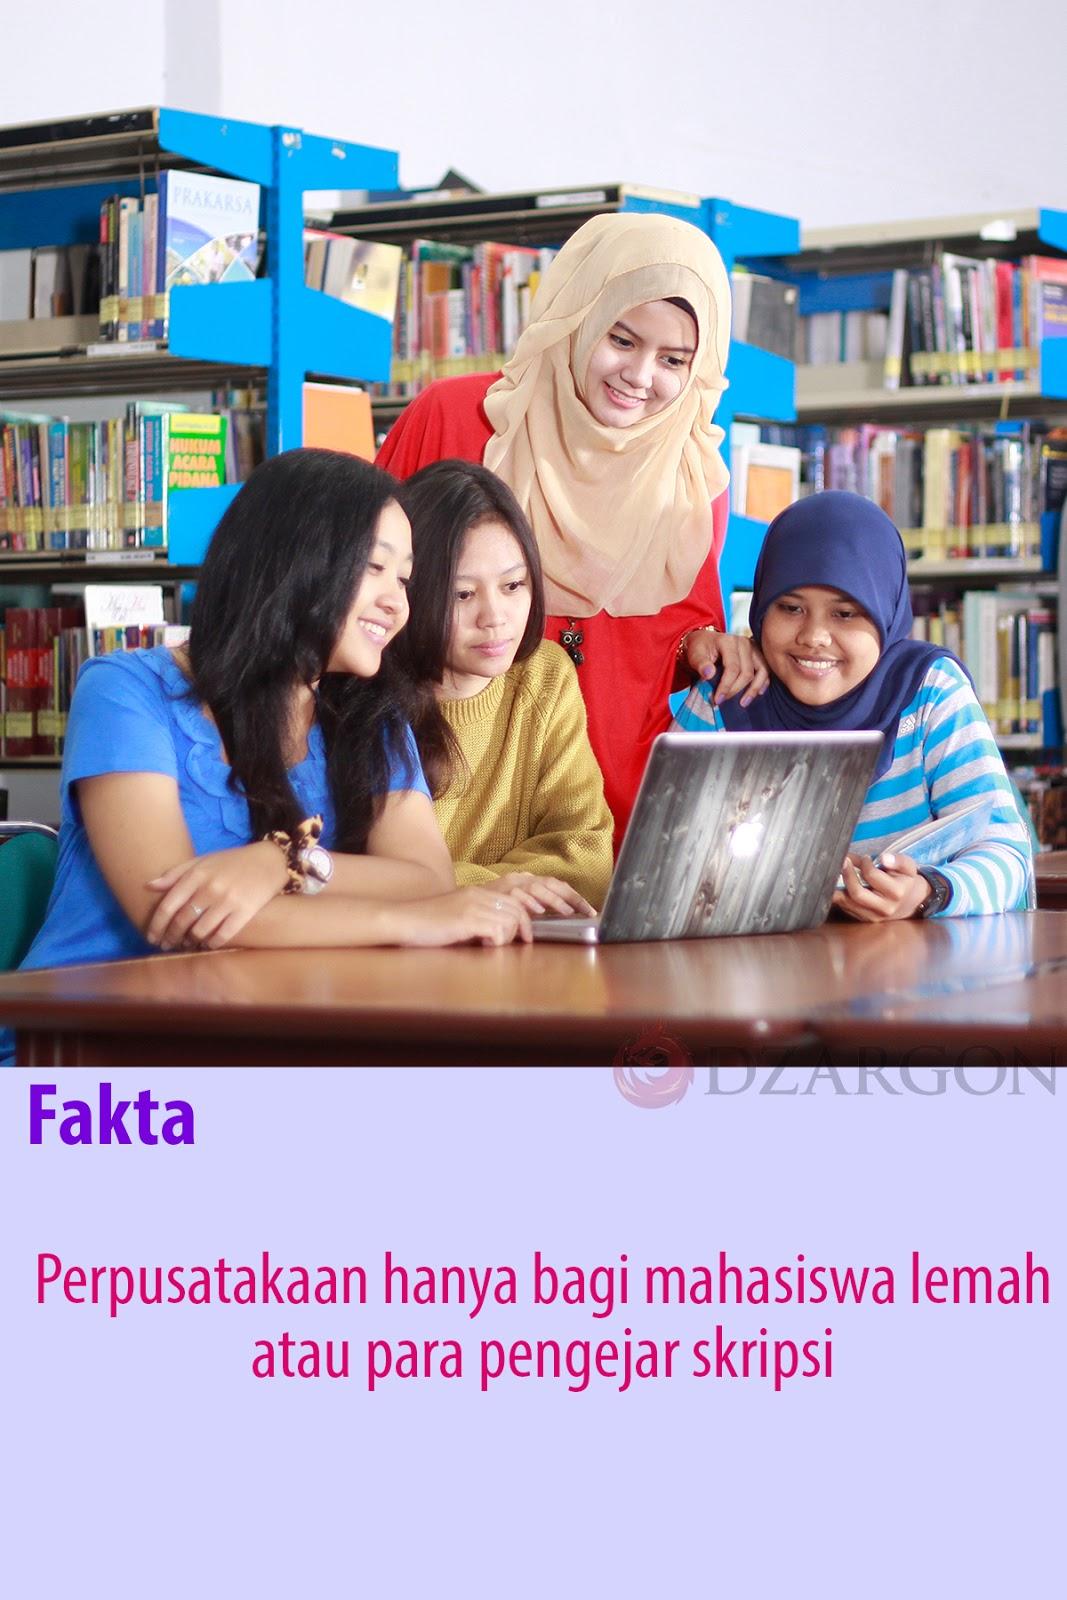 Mahasiswa masuk ke perpustakaan